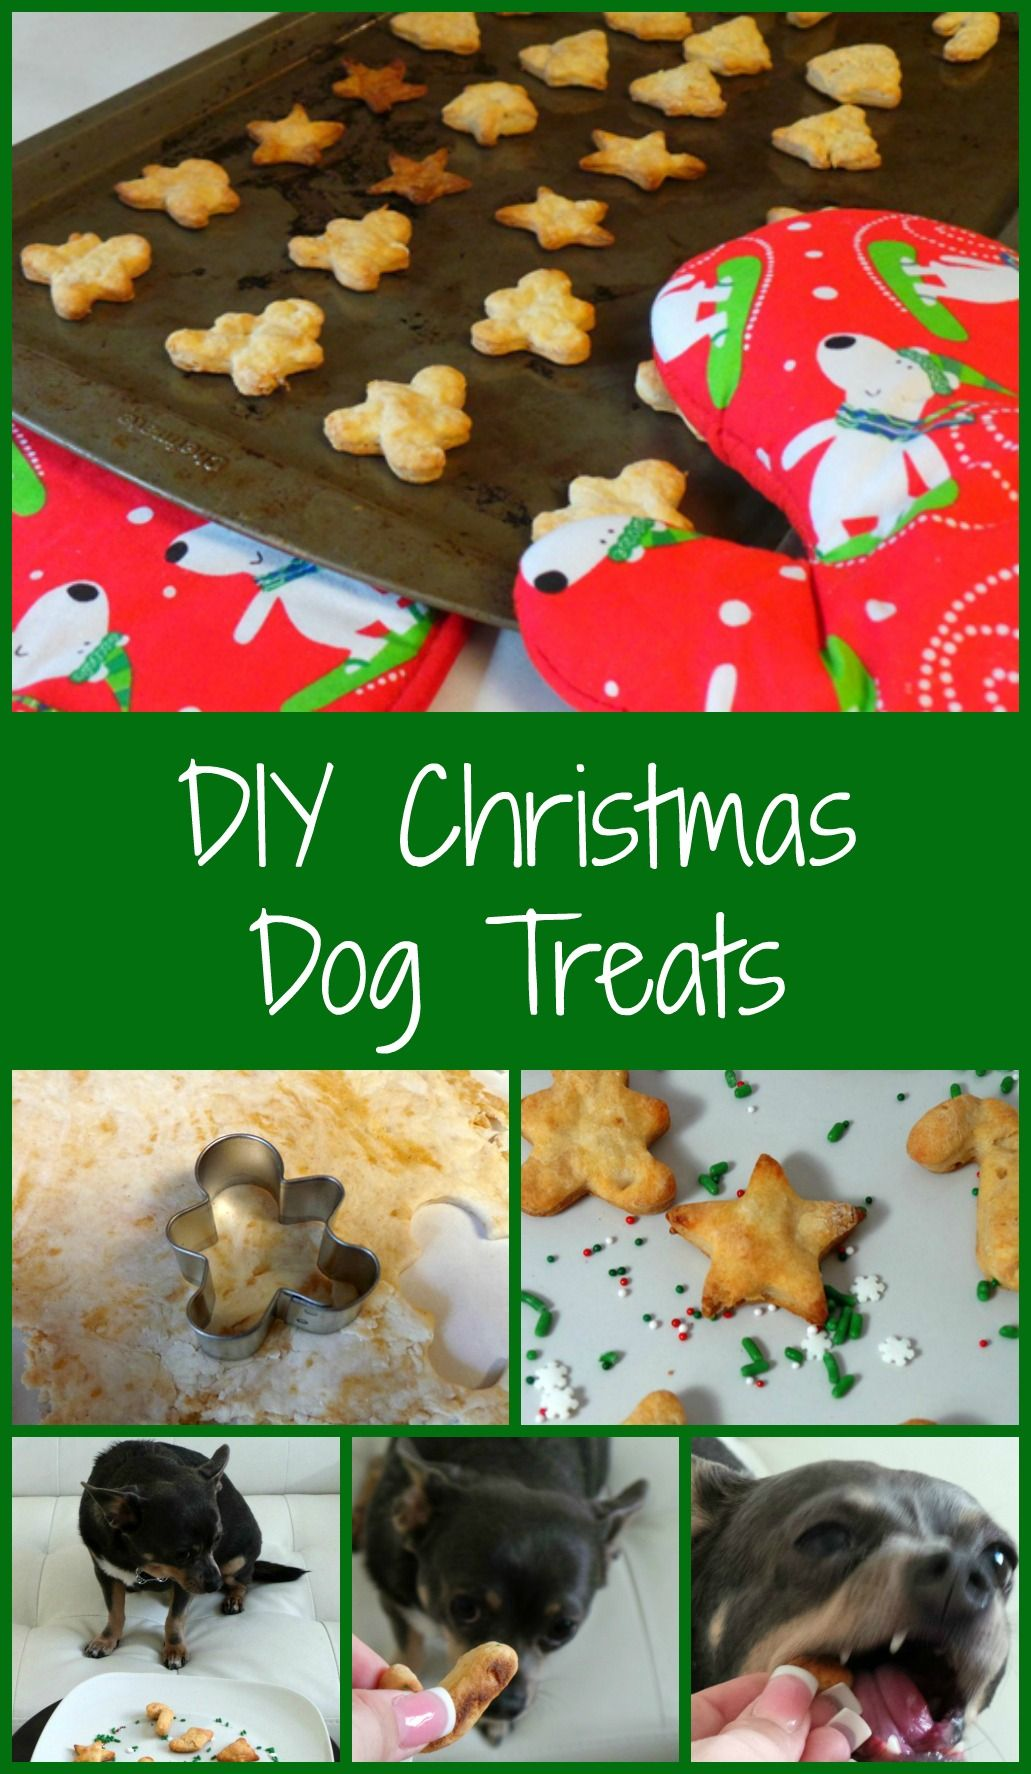 Diy Christmas Dog Treats Diy Dog Projects Pinterest Diy